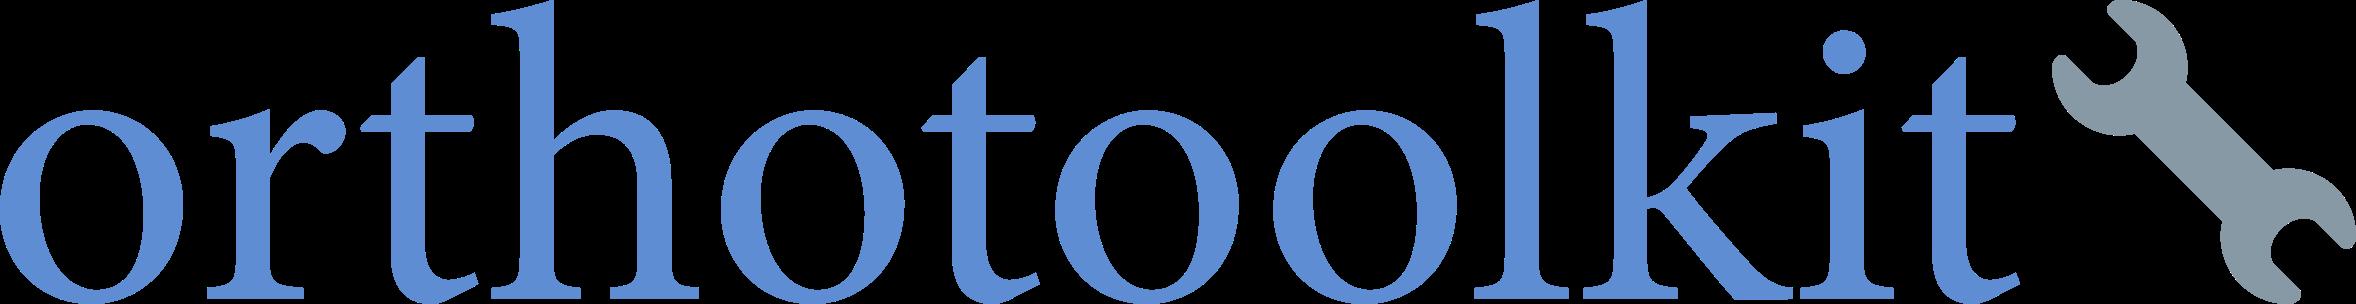 Free Online QuickDASH Score Calculator - OrthoToolKit